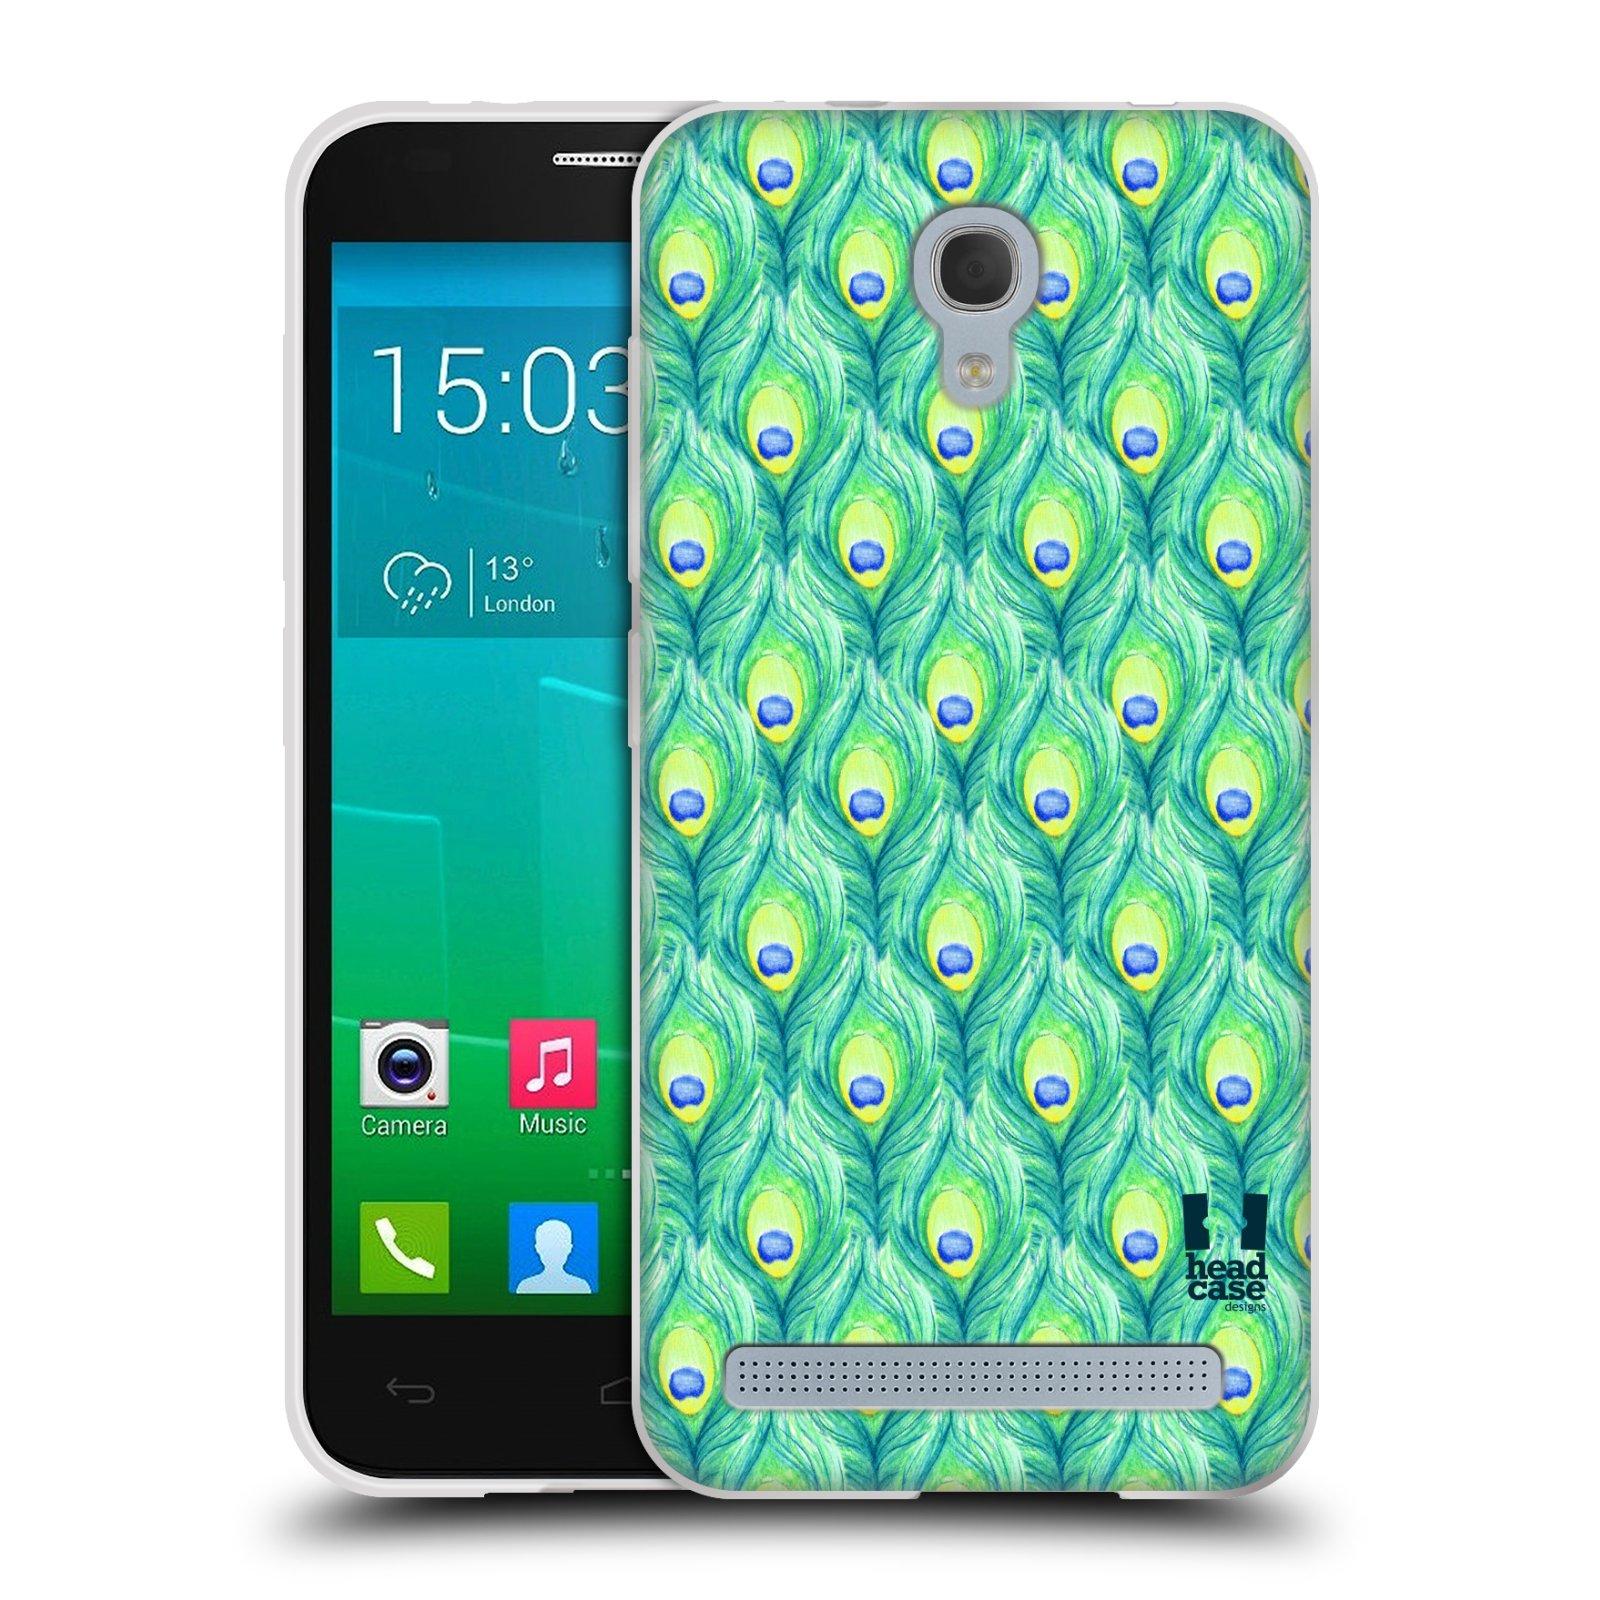 Silikonové pouzdro na mobil Alcatel One Touch Idol 2 Mini S 6036Y HEAD CASE PÍRKA PATTERN